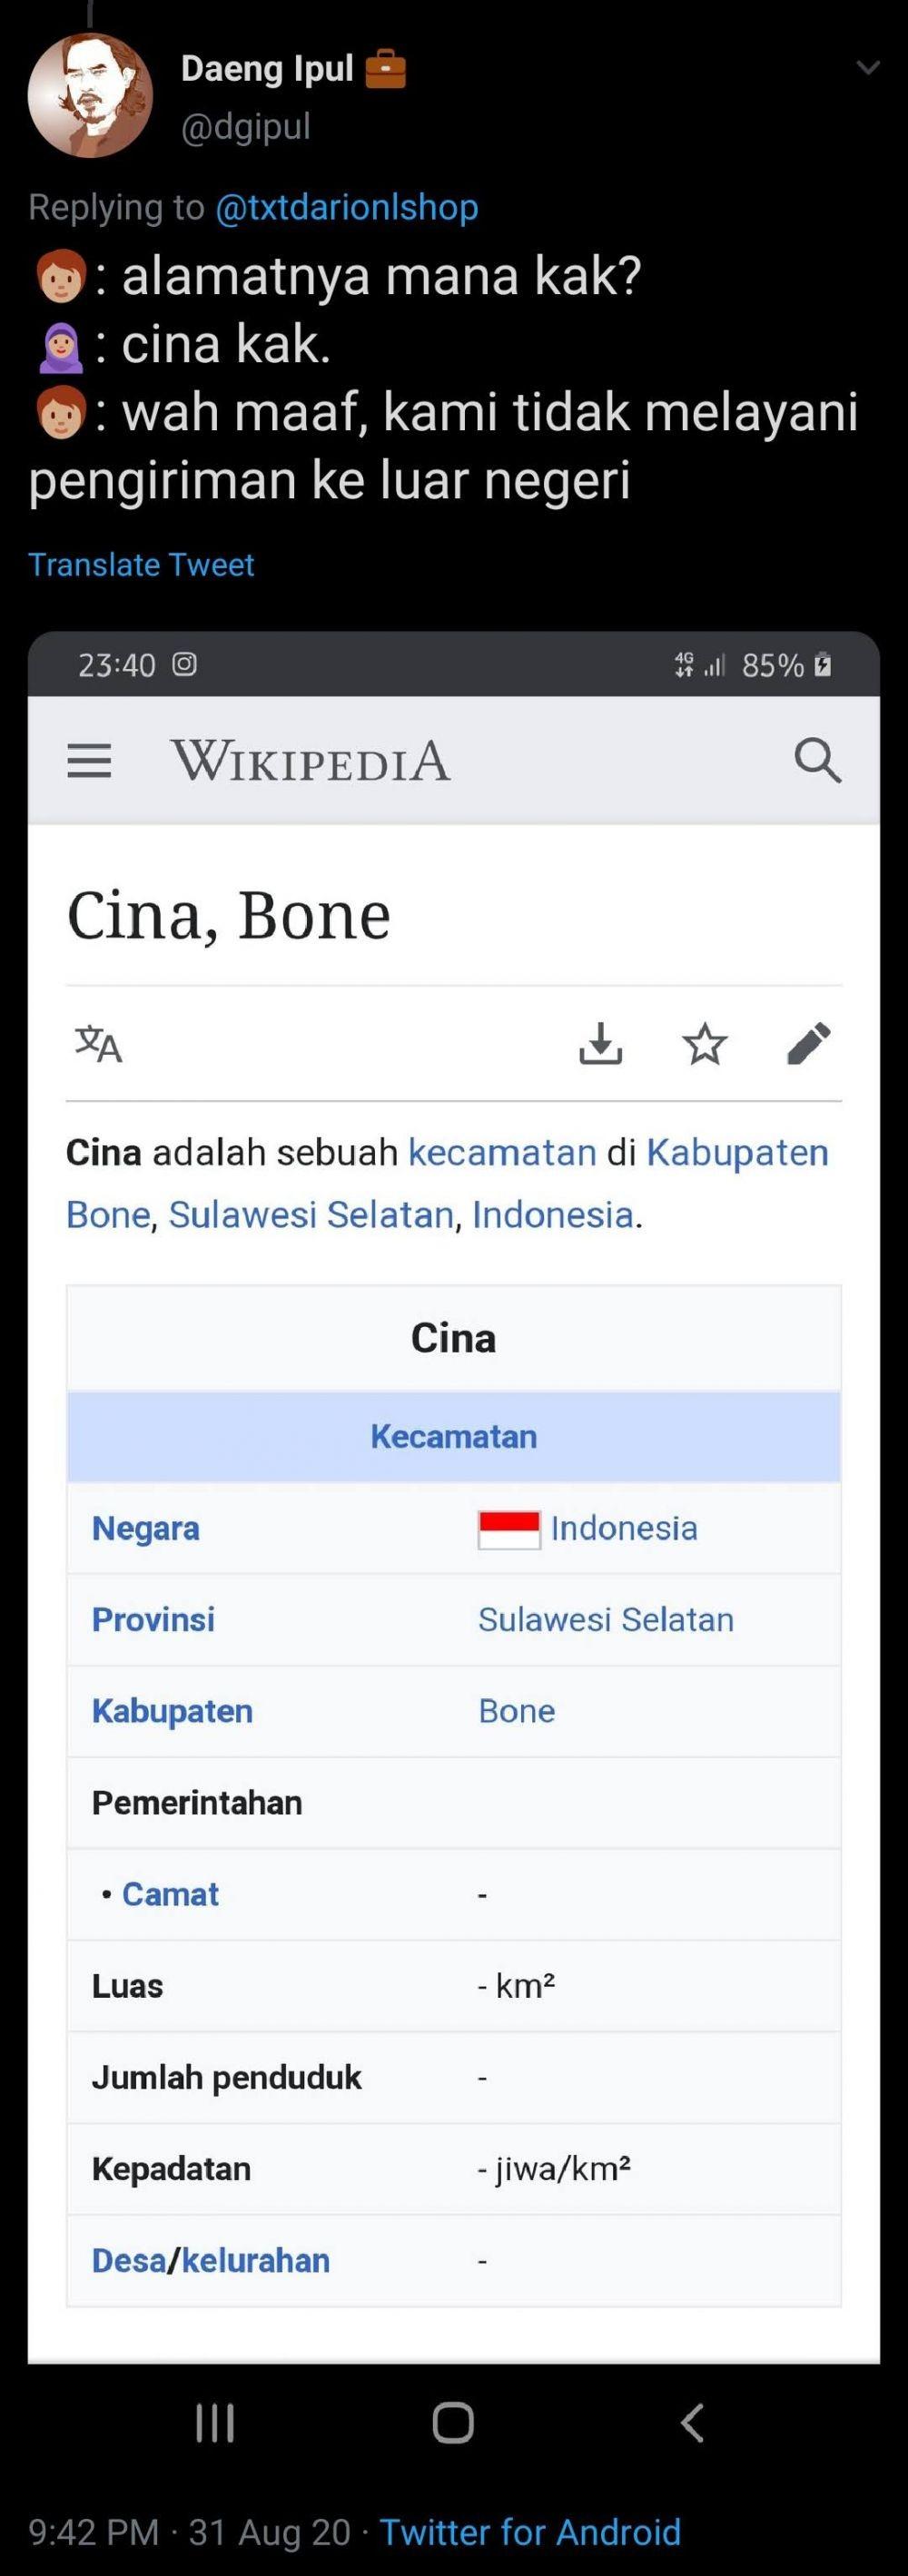 nama kota unik Twitter